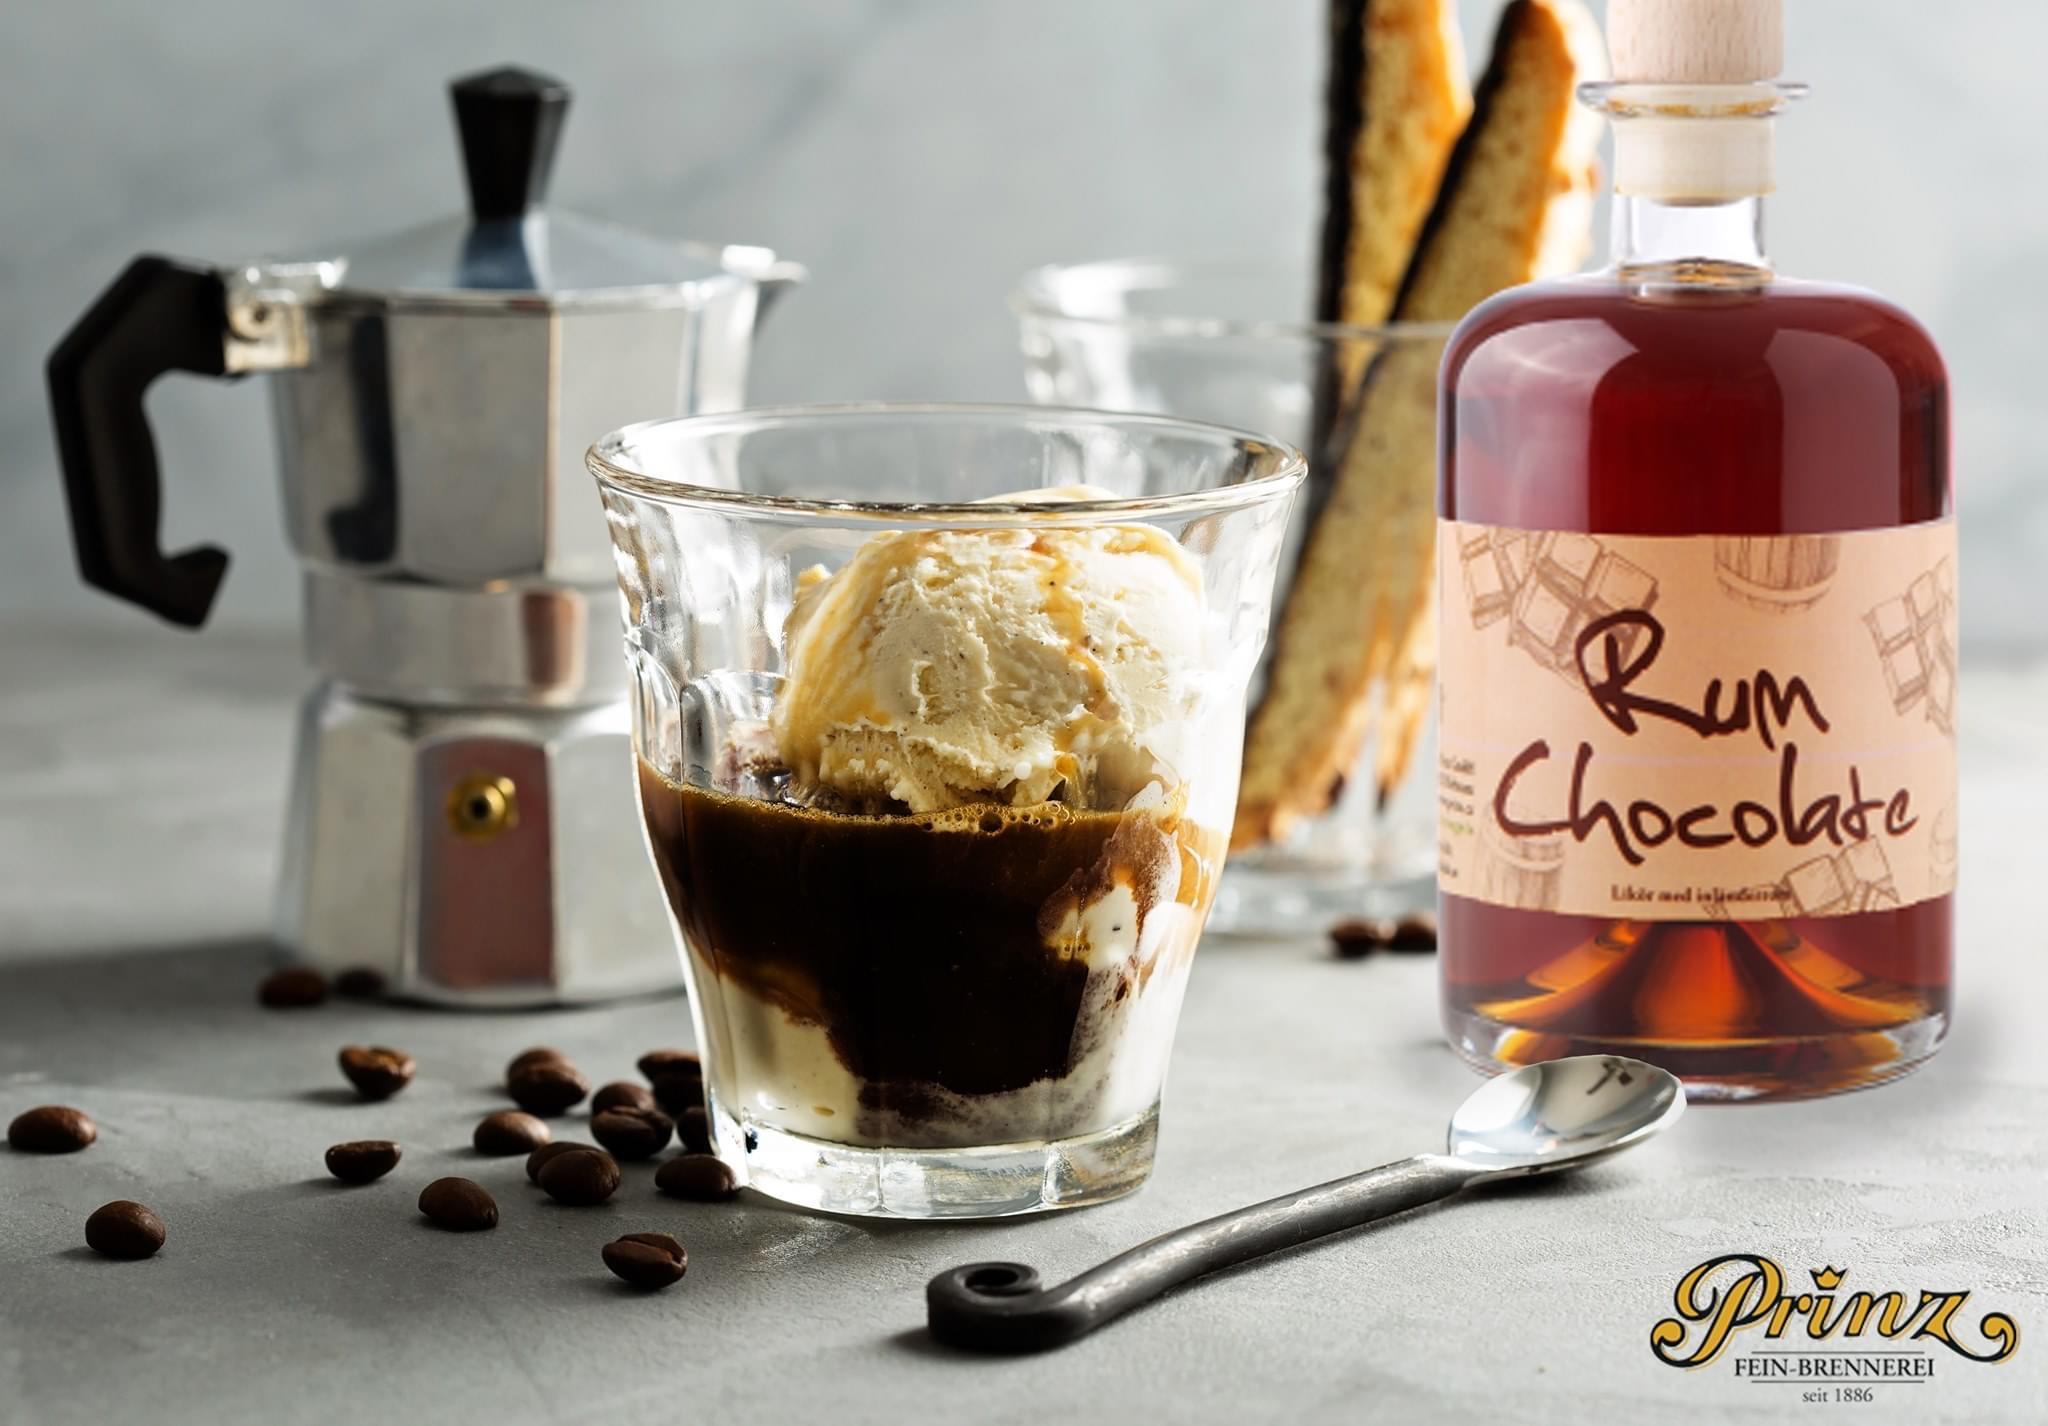 prinz chocolate rum